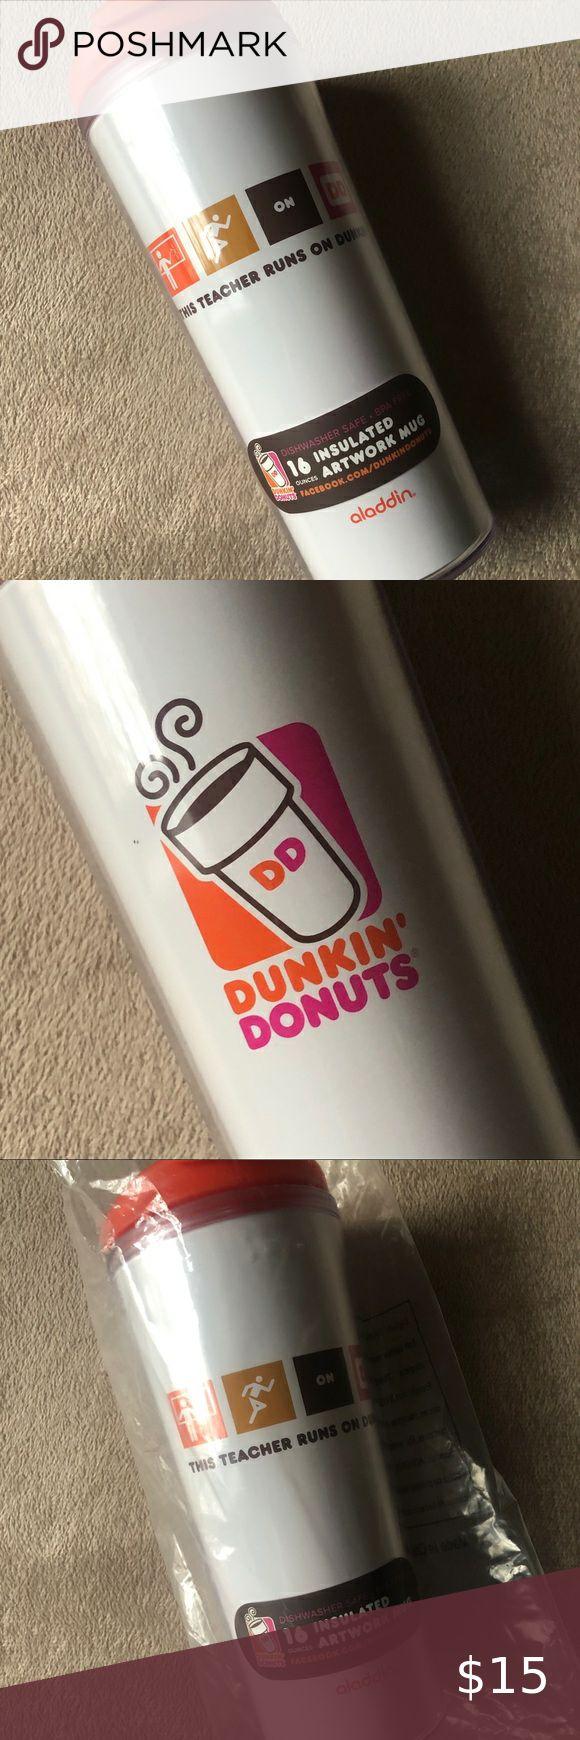 NEW Dunkin Donuts 16oz Artwork Tumbler NWT in 2020